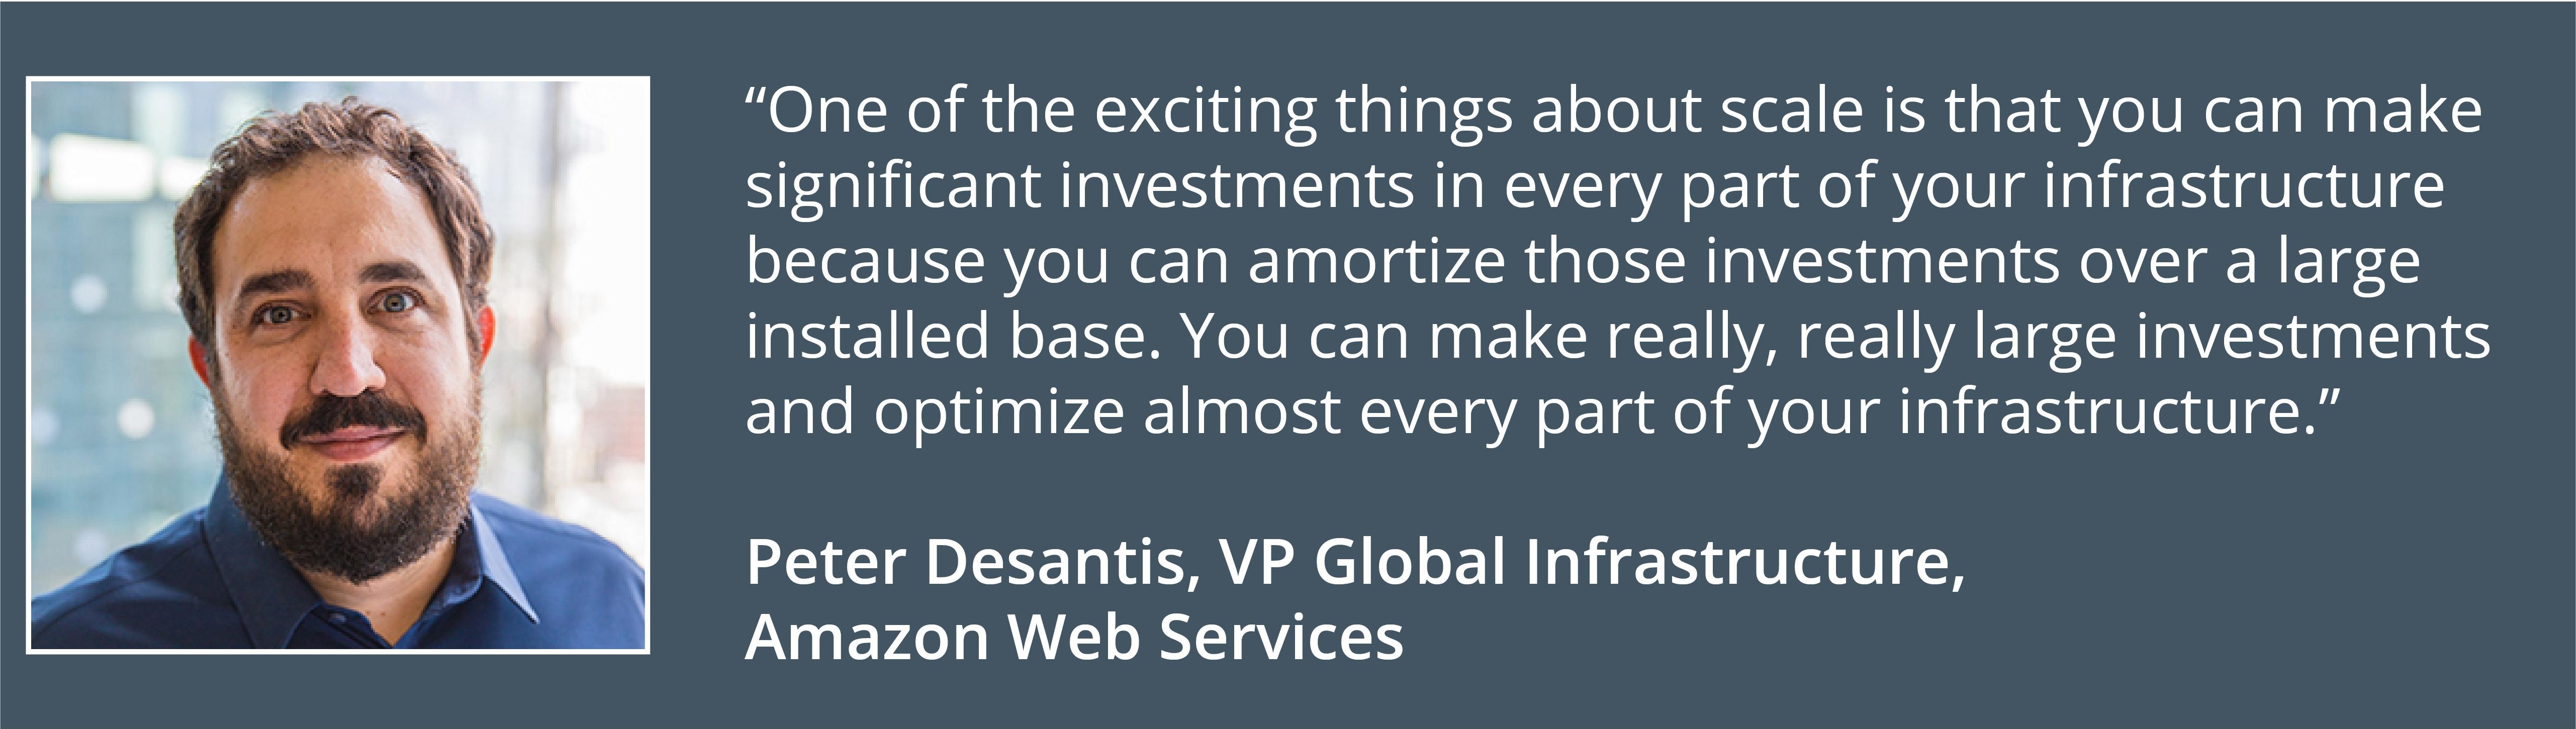 Peter Desantis, VP Global Infrastructure, AWS